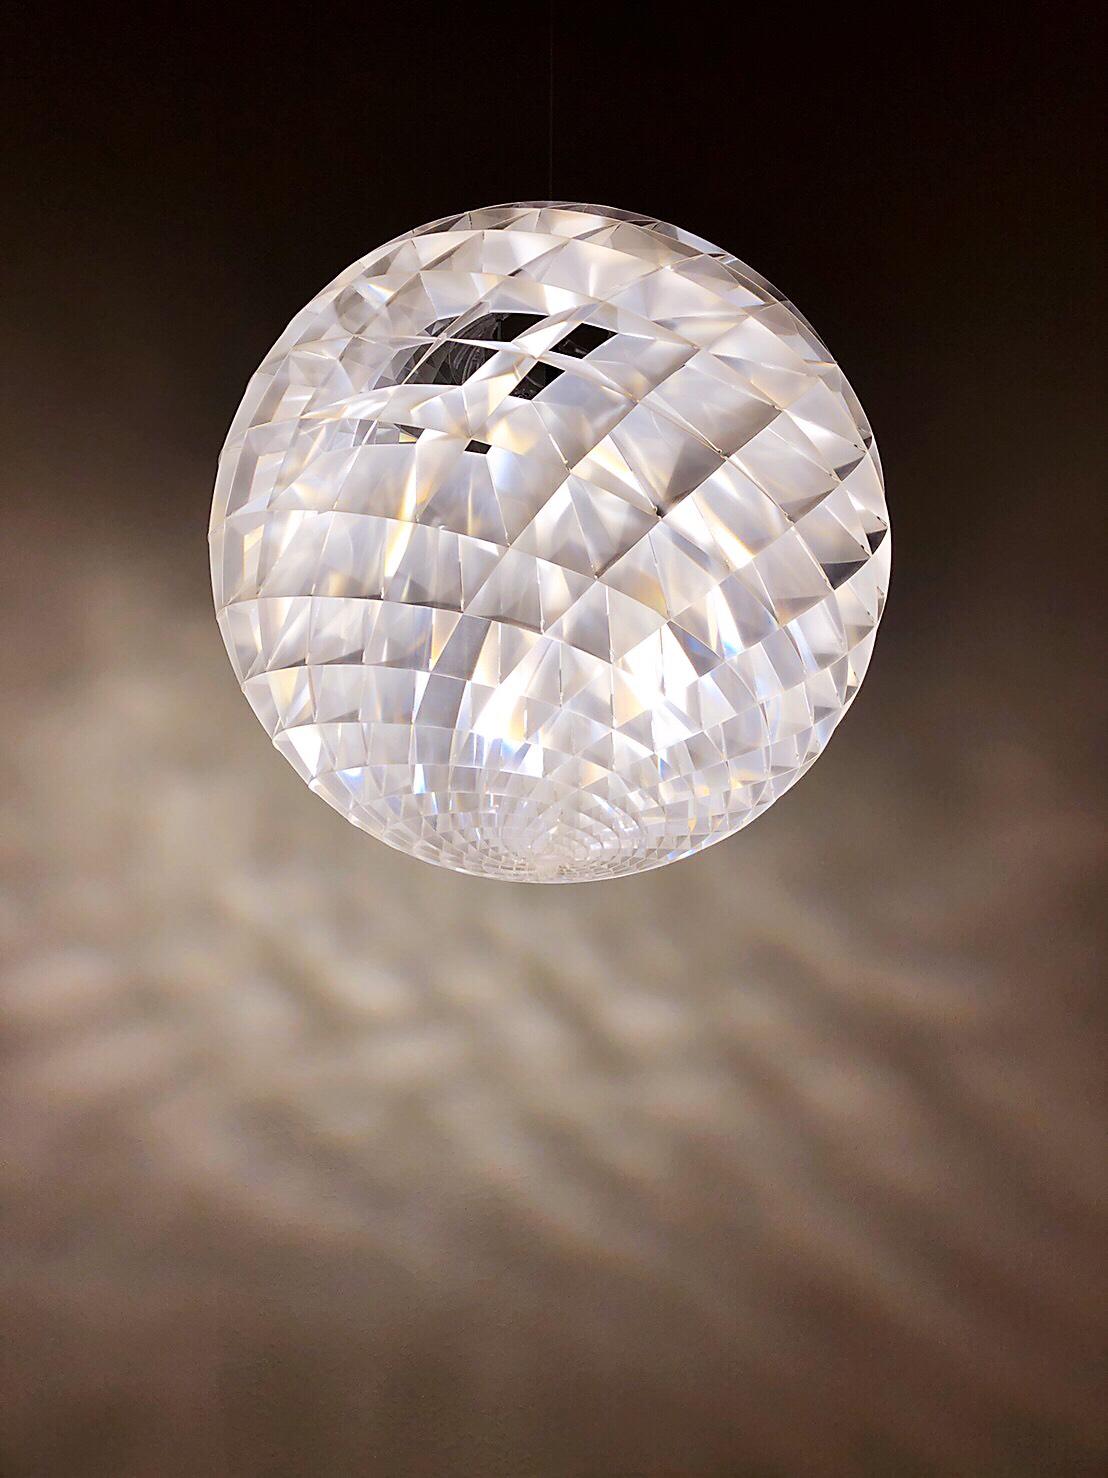 PATERA IN A SILVER FOIL FINISH   銀色版本的 Patera 讓空間散發耀眼光芒!設計師 Slaatto 從極簡主義走向輝煌華麗,卻完美保留自然光源,讓空間帶來一種雄偉的氛圍。絢麗的光芒,由原本的PVC覆上銀箔製成,在光線和陰影間交織成輝煌的構圖。